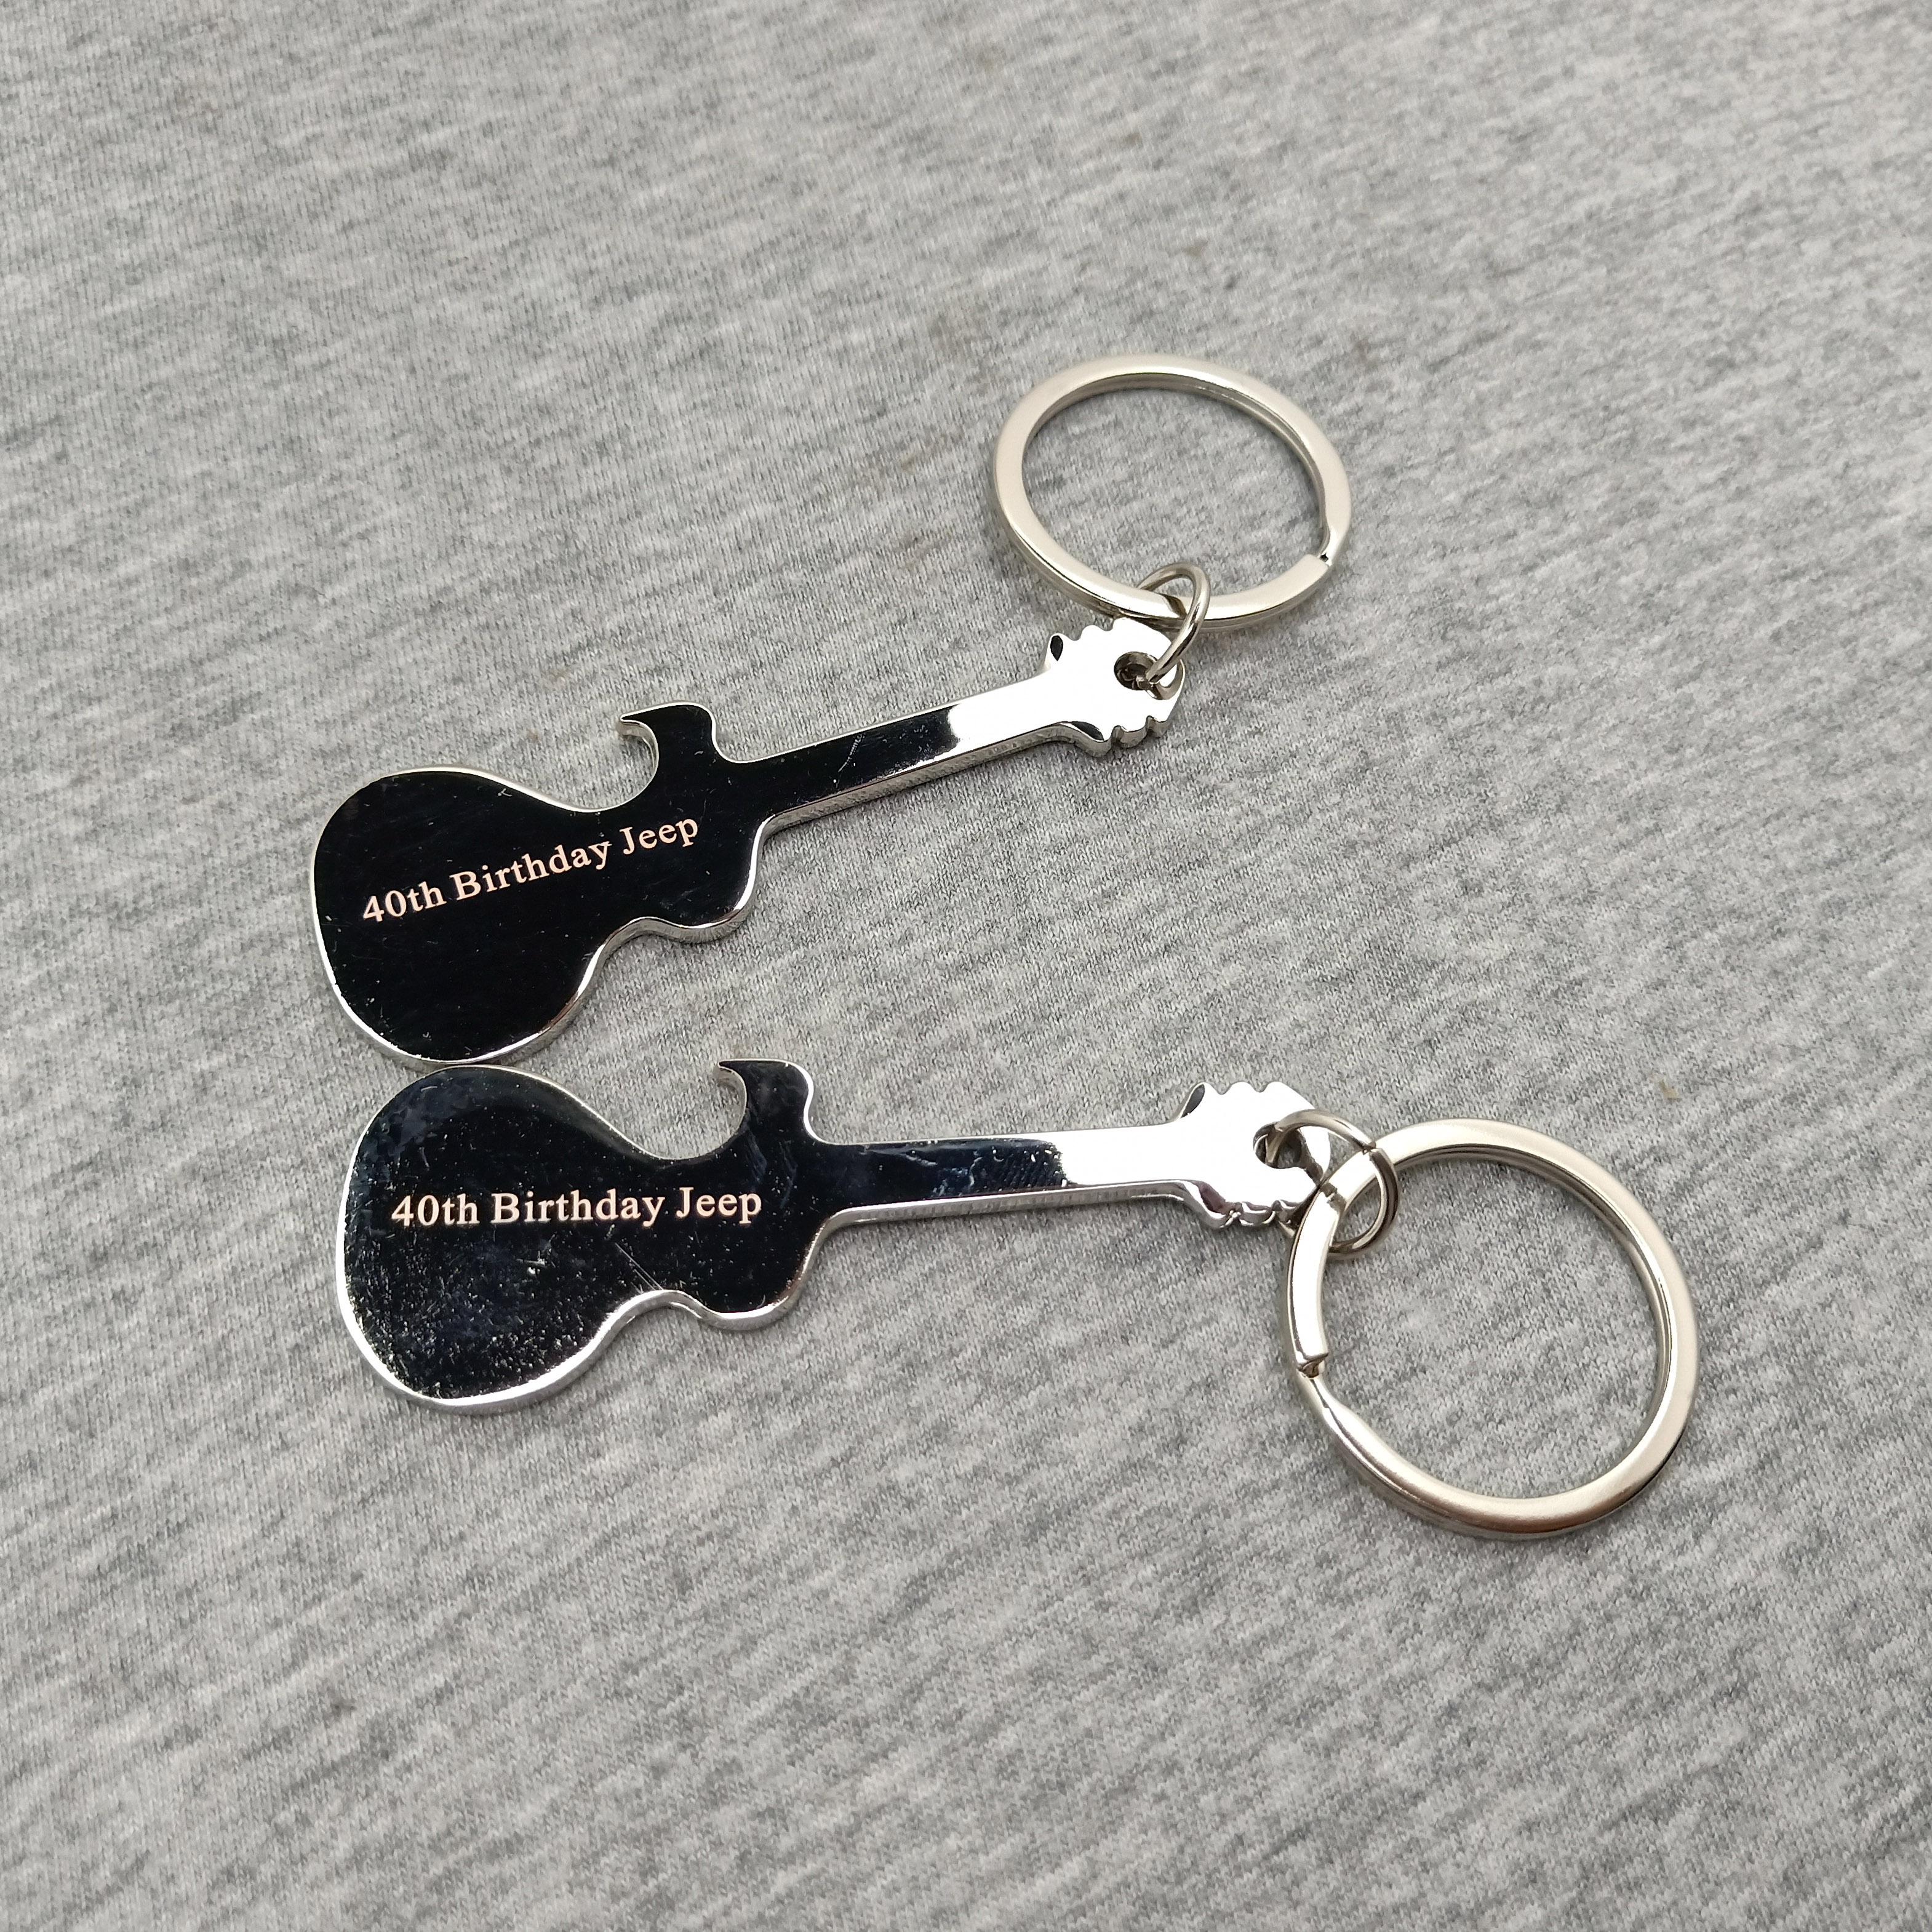 HOT SALE] 50x Promotional Gift Item Bottle Opener Keychain